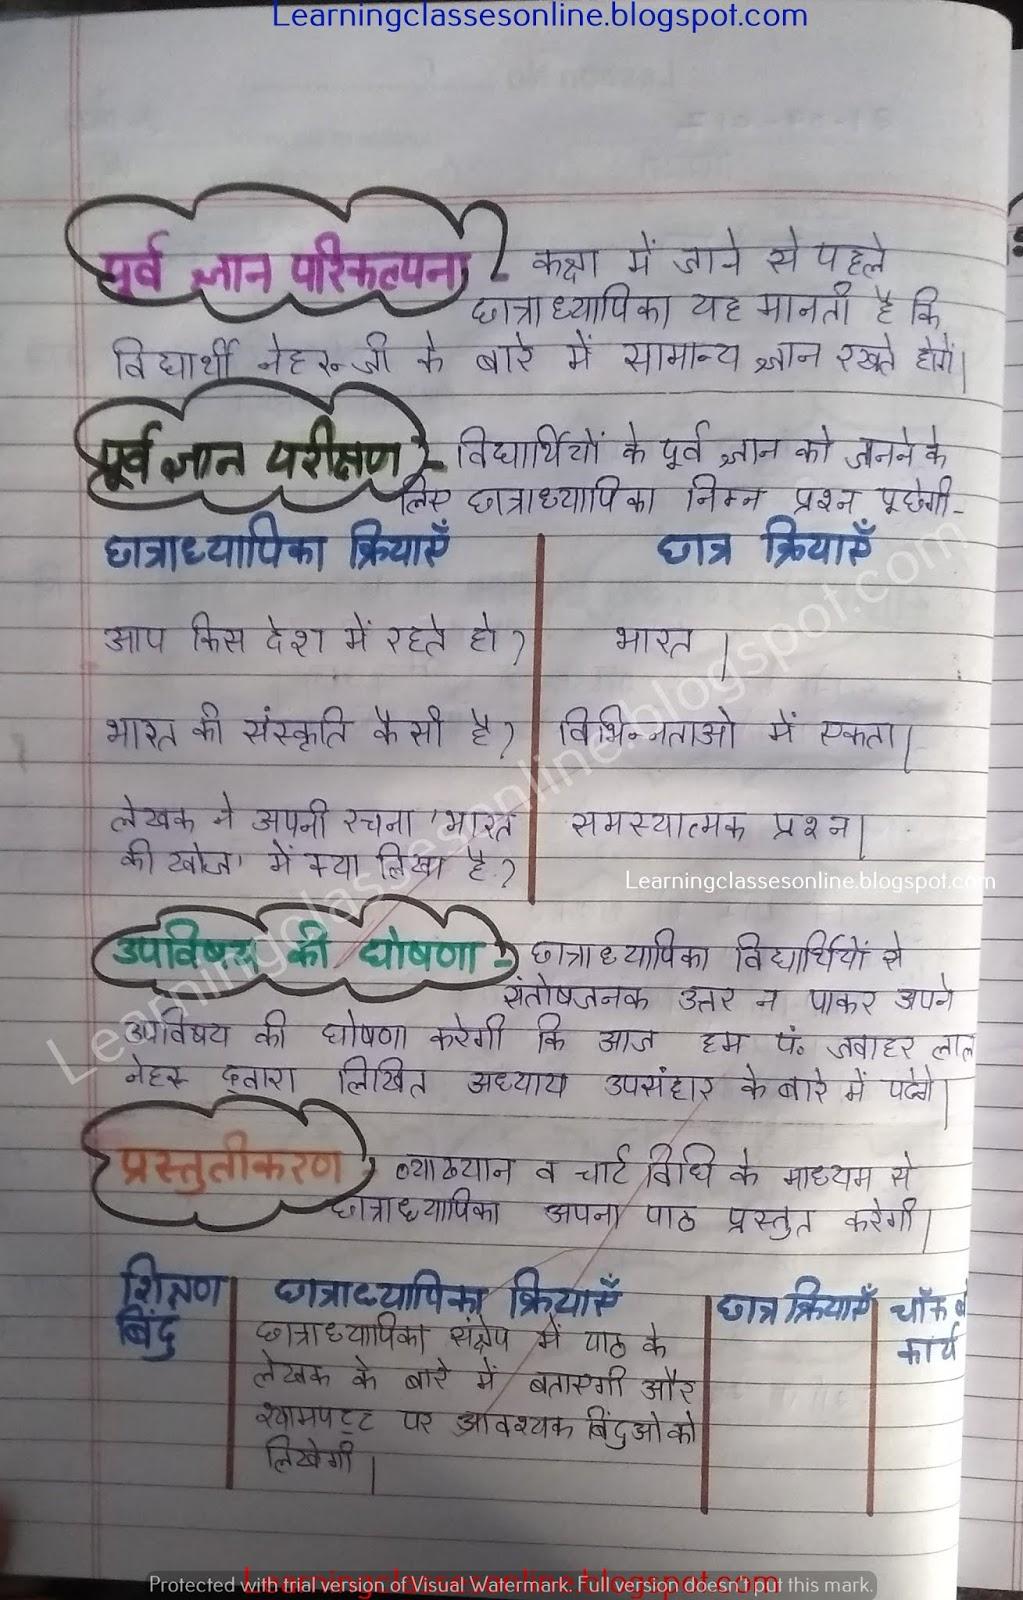 BTC lesson plan in hindi for class 8 teachers